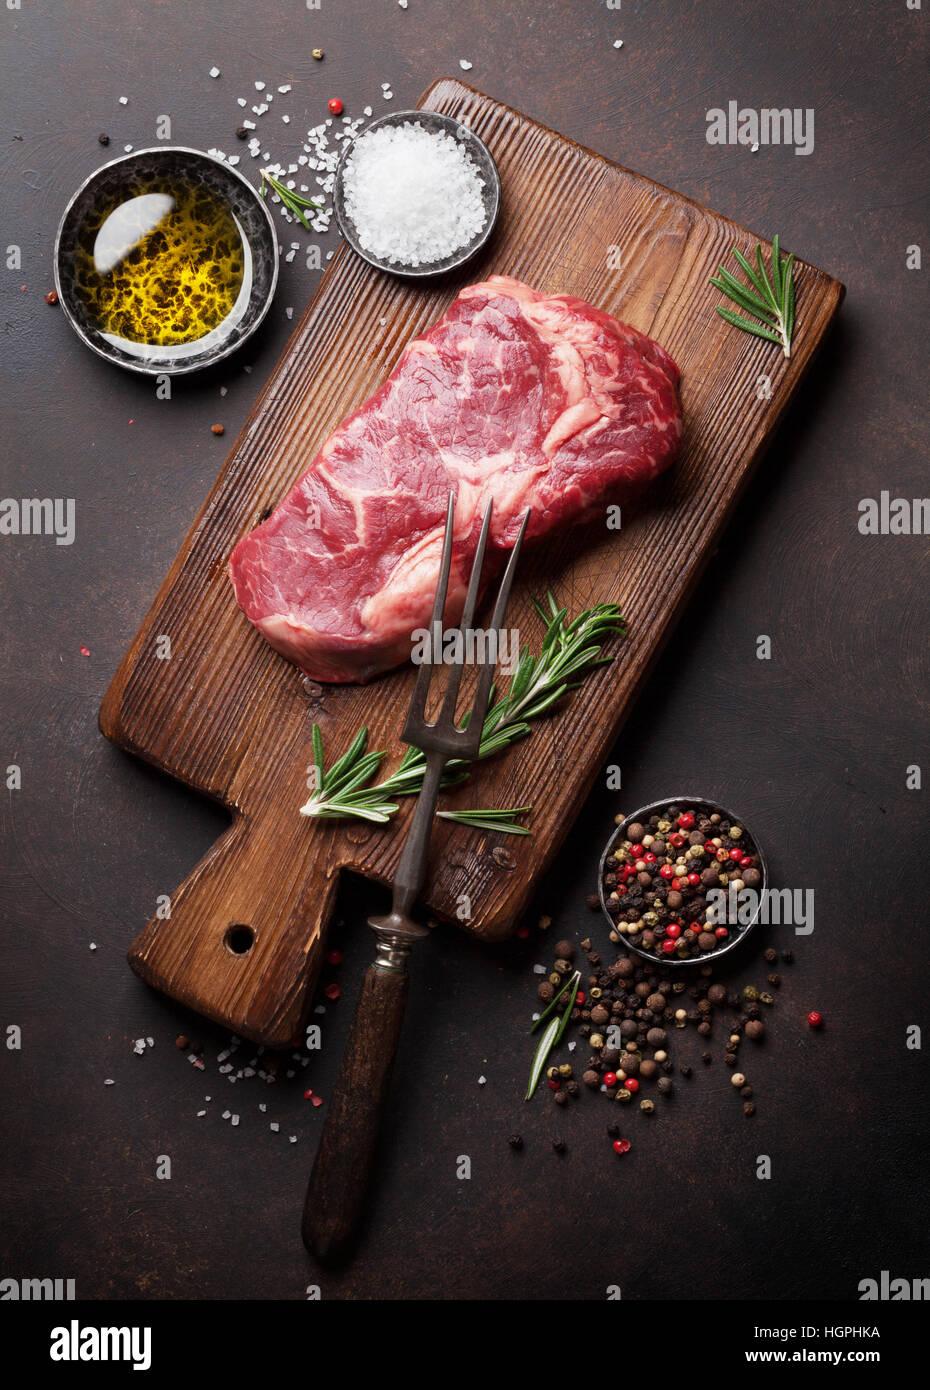 Ingredients im genes de stock ingredients fotos de stock for Cocinar filetes de ternera